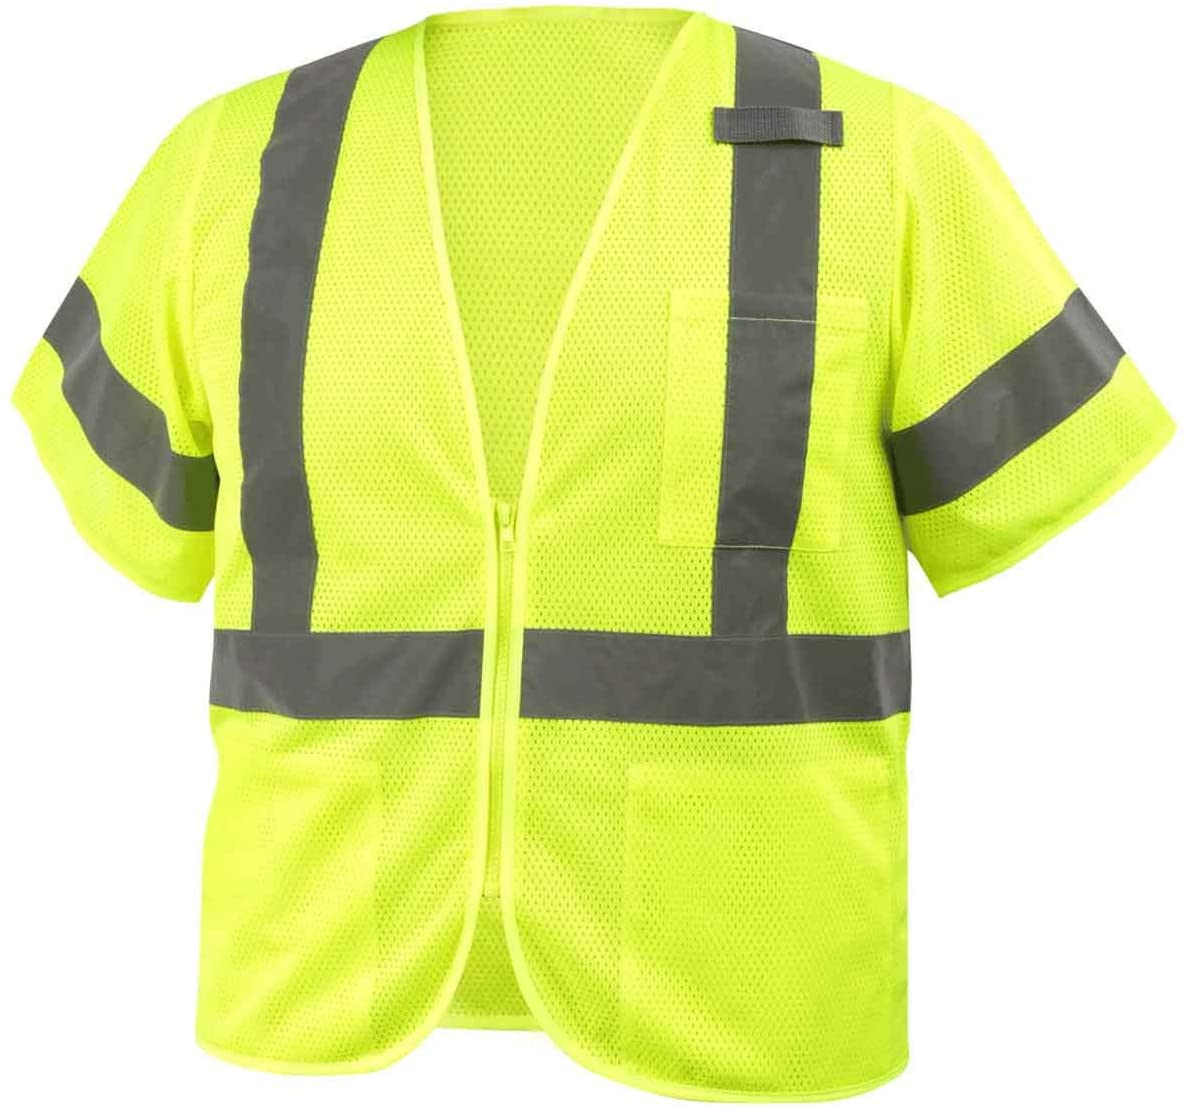 Black Stallion VS2030 ANSI Class 3 Short Sleeve Hi-Vis Safety Vest, Lime, Small